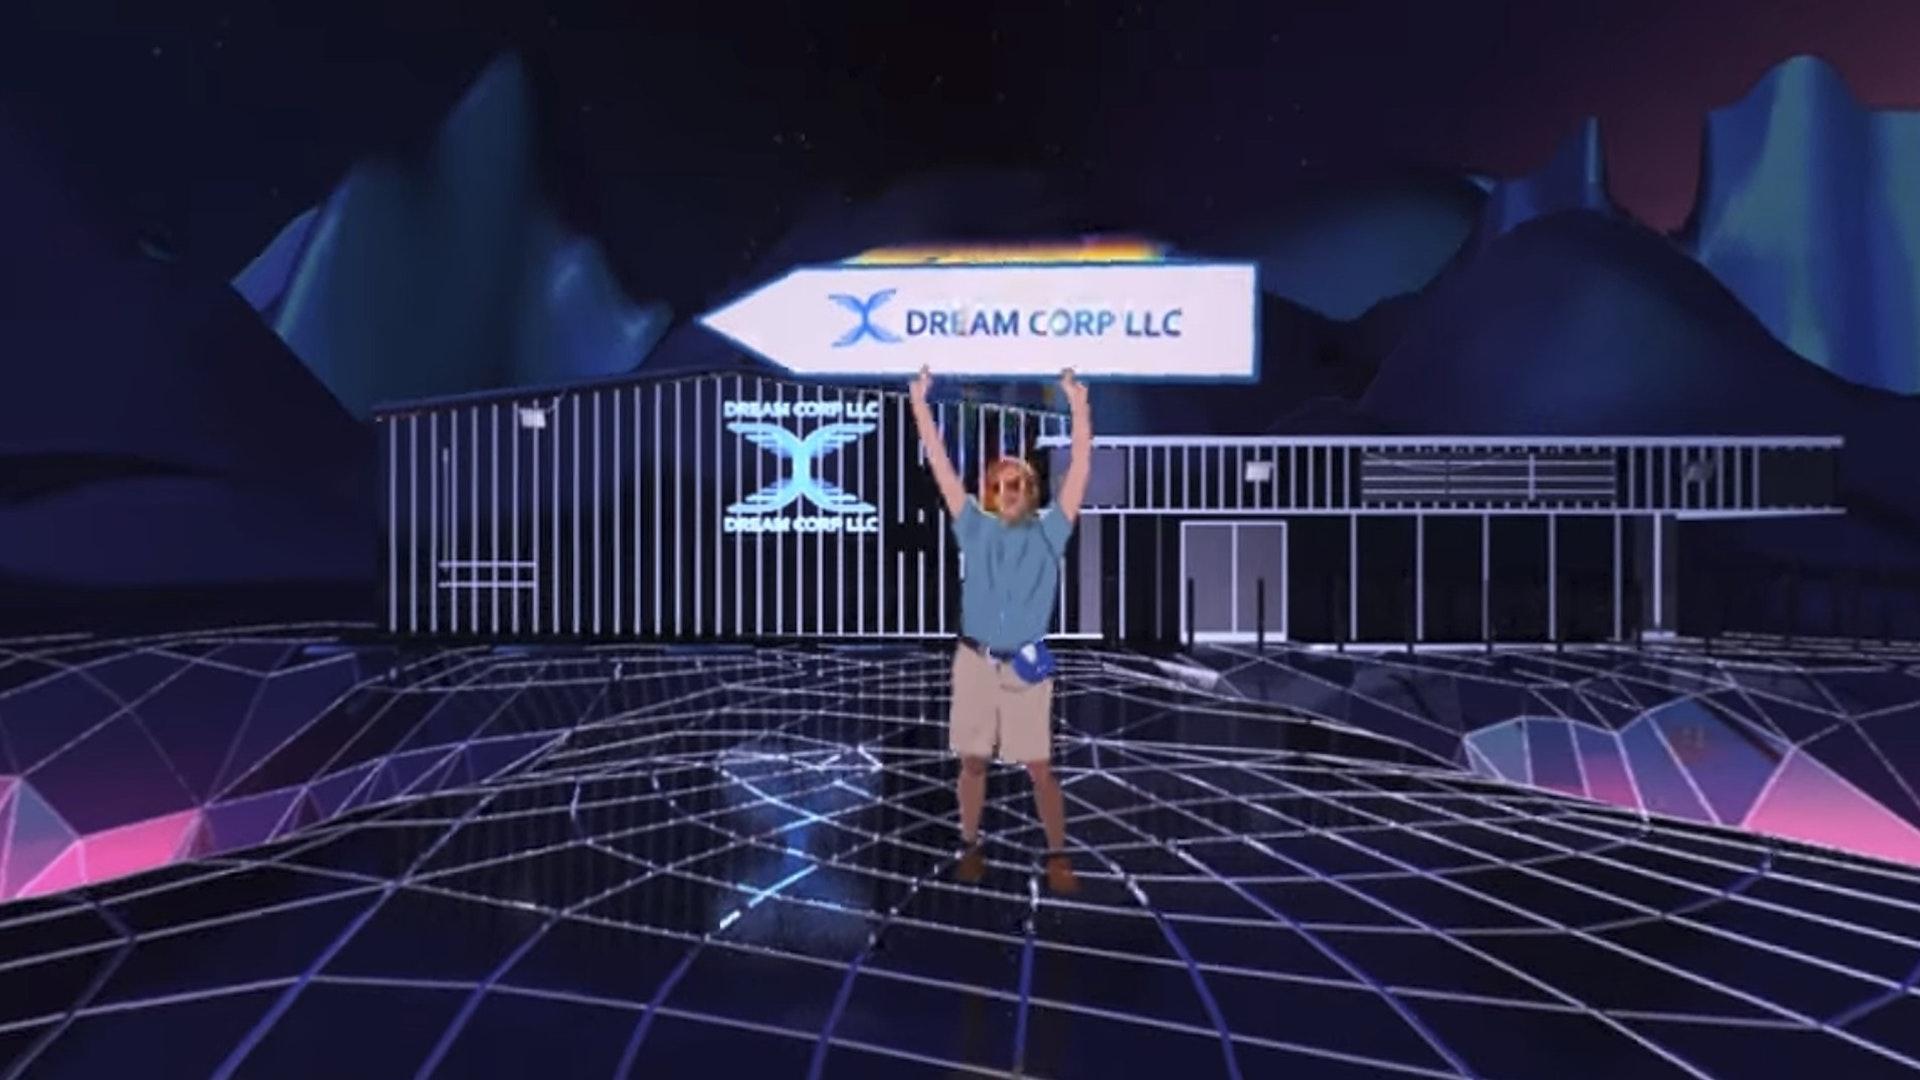 Dream Vault: A Dream Corp LLC VR Experience